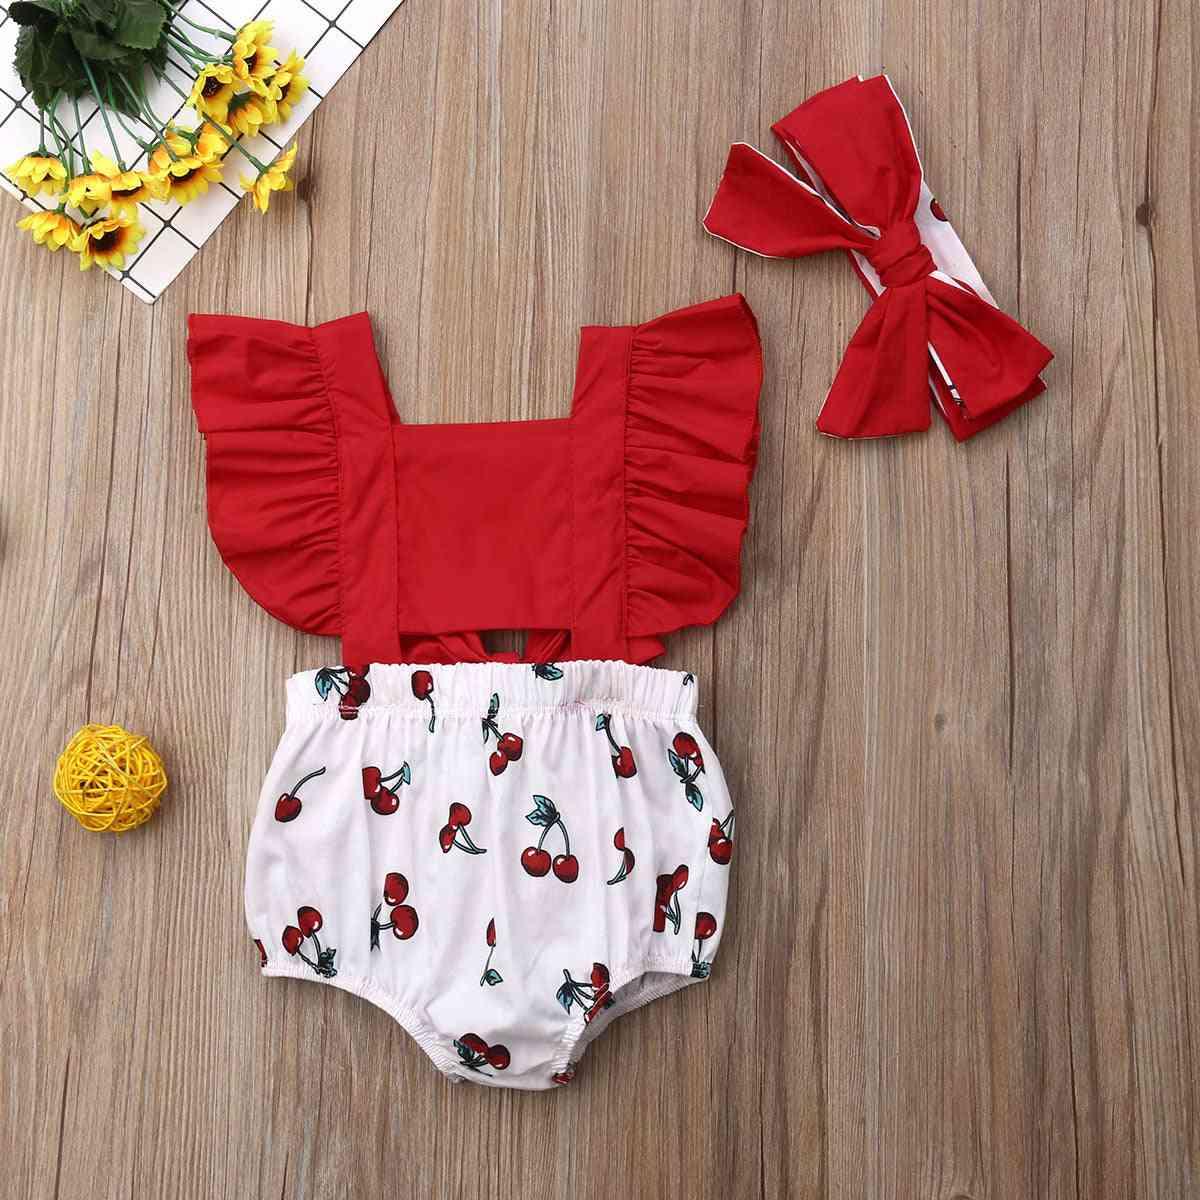 Newborn Baby Girl Ruffle Cherry Print Bodysuits Headband Sunsuit Outfits Summer Clothe